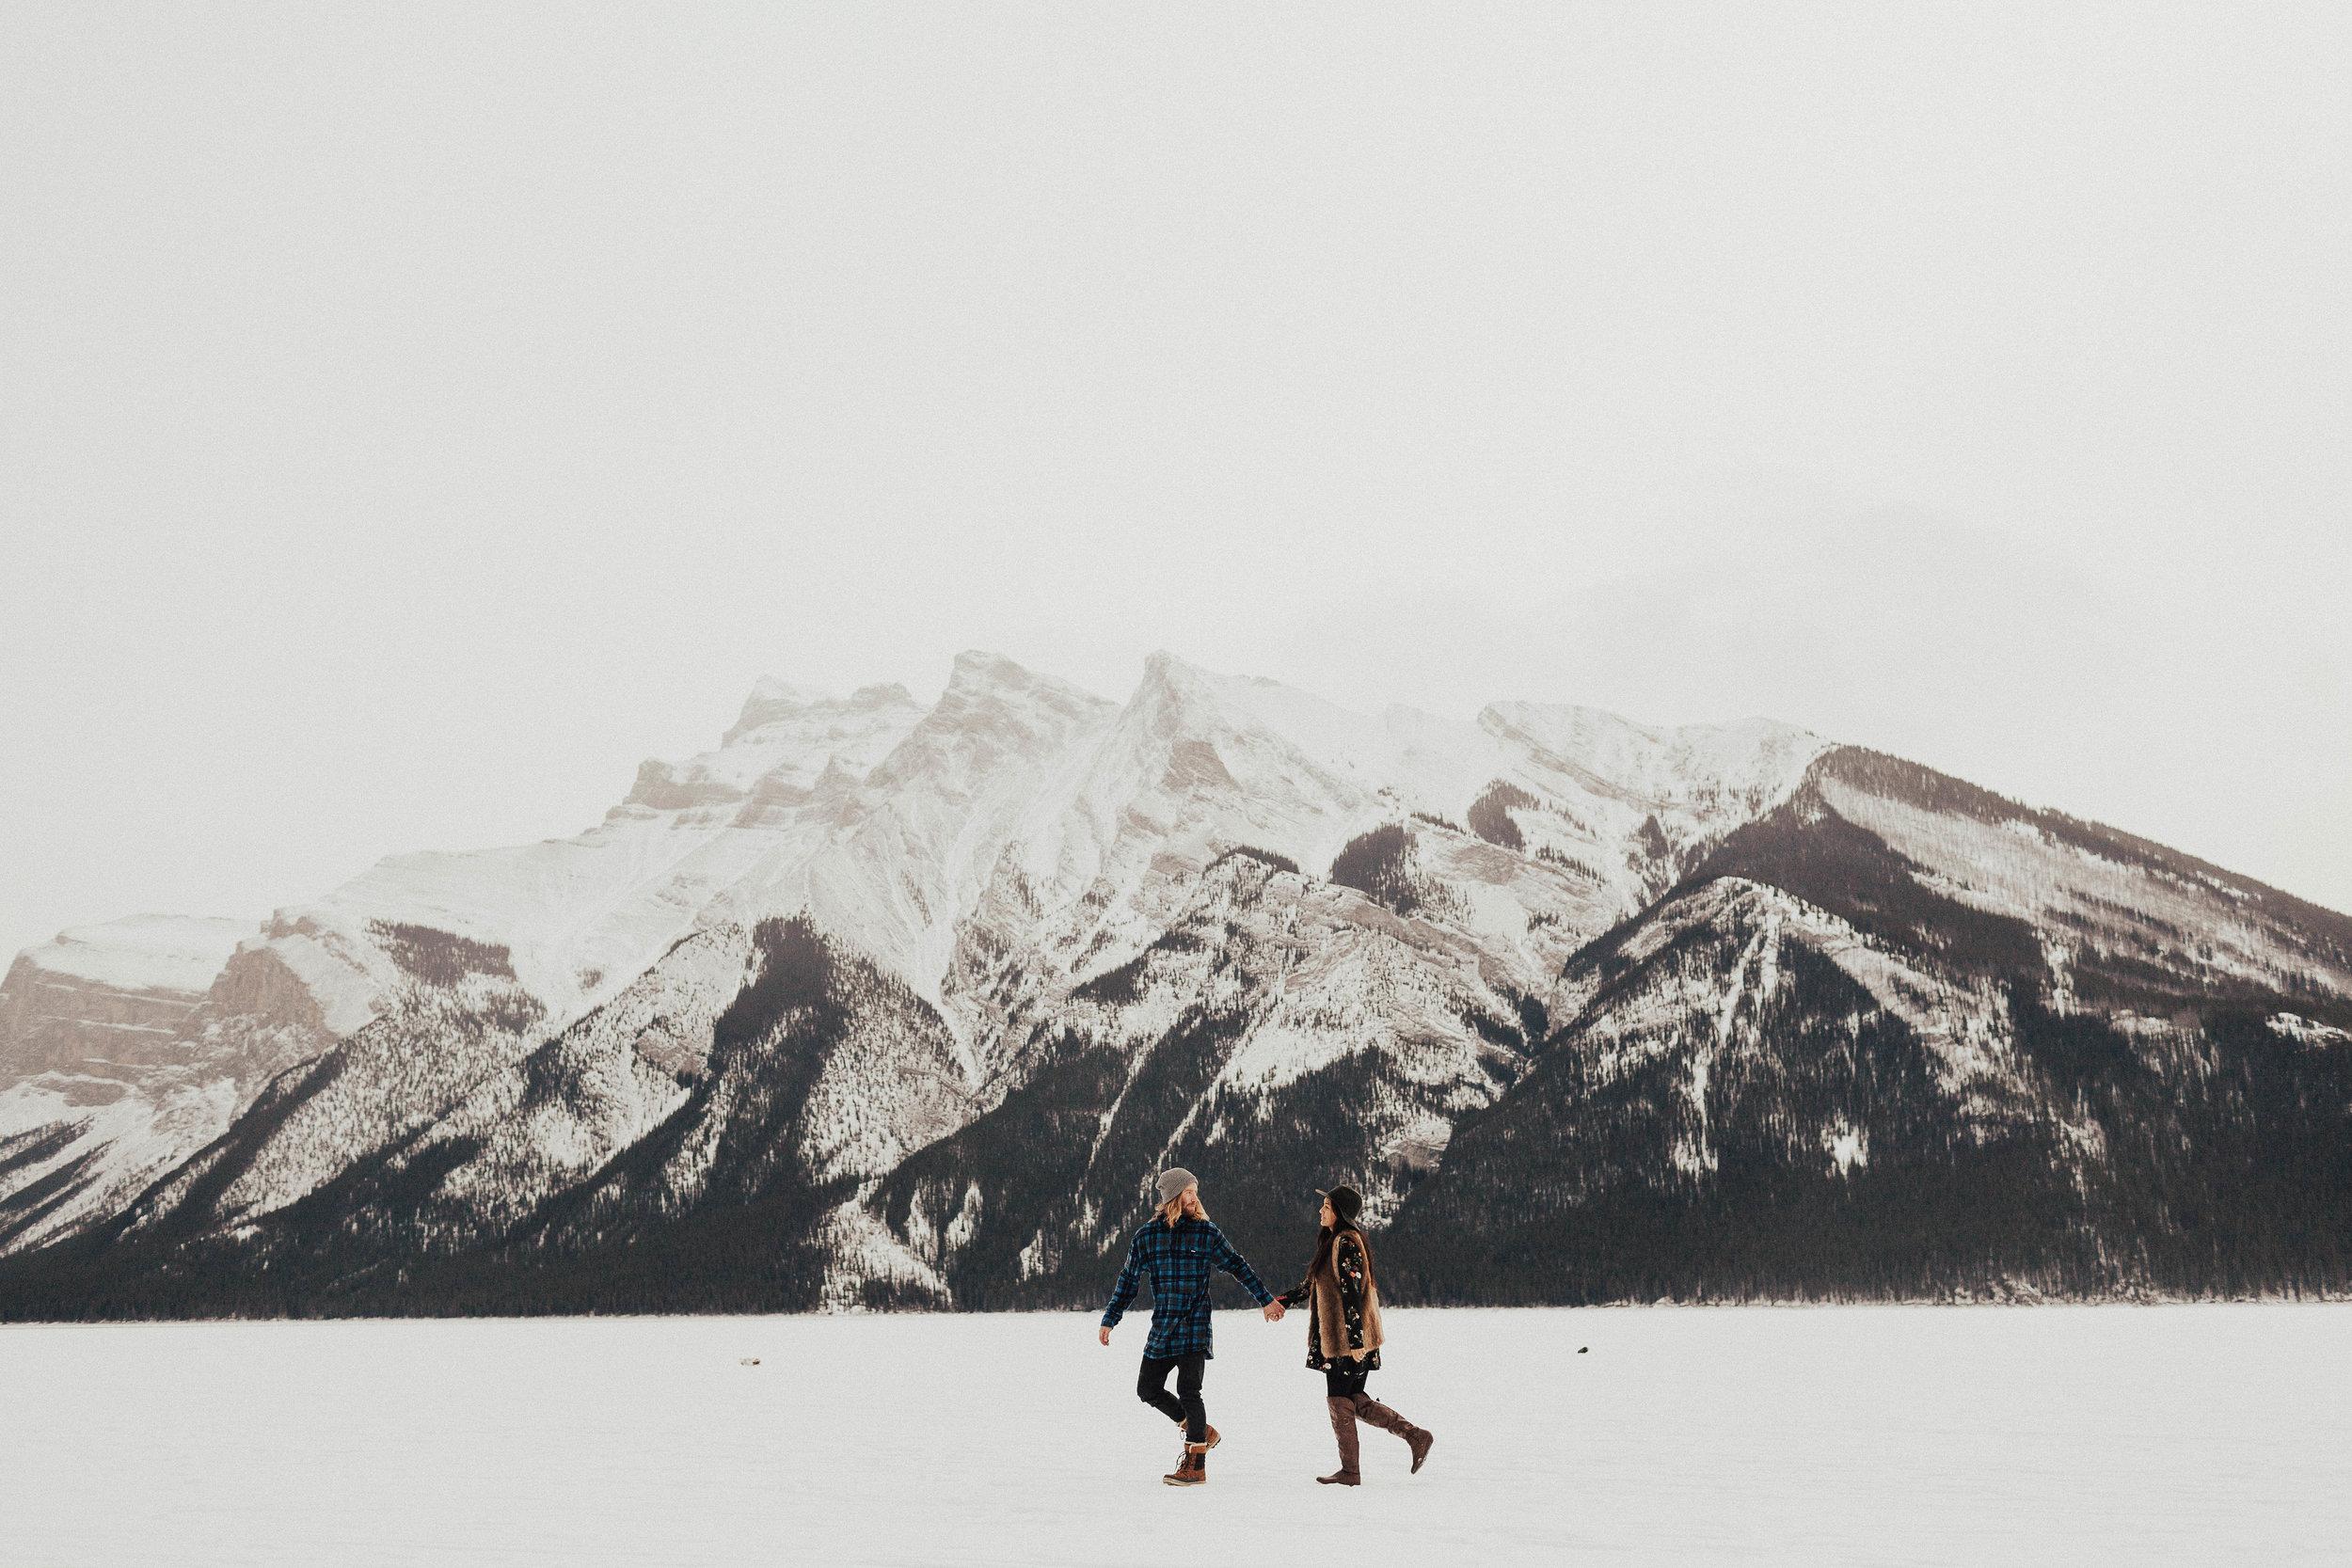 Banff Engagement Photographer - Winter Mountain Adventure Engagement Session - Michelle Larmand Photography-034